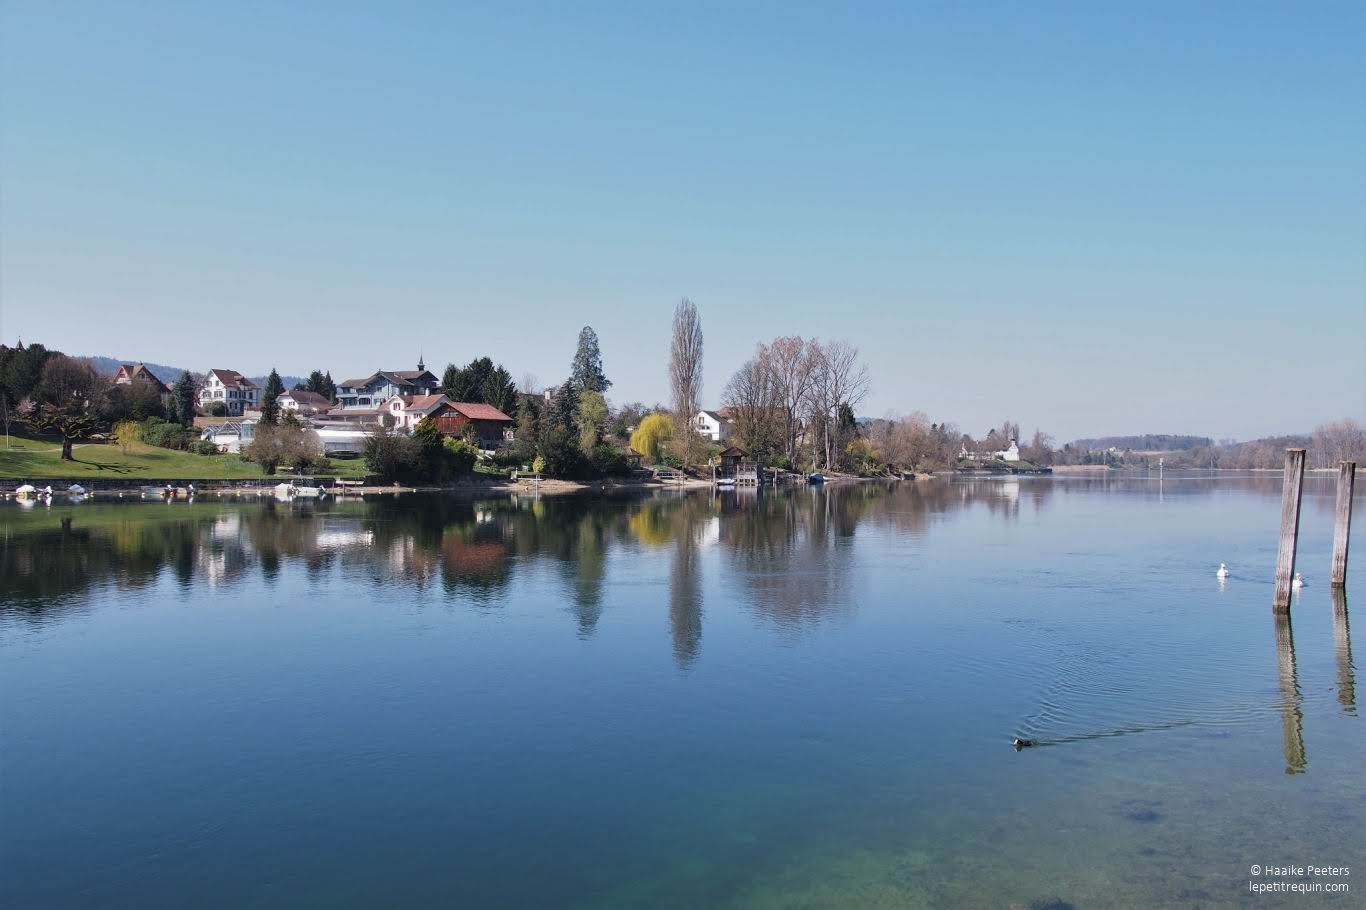 Stein am Rhein (Le petit requin)